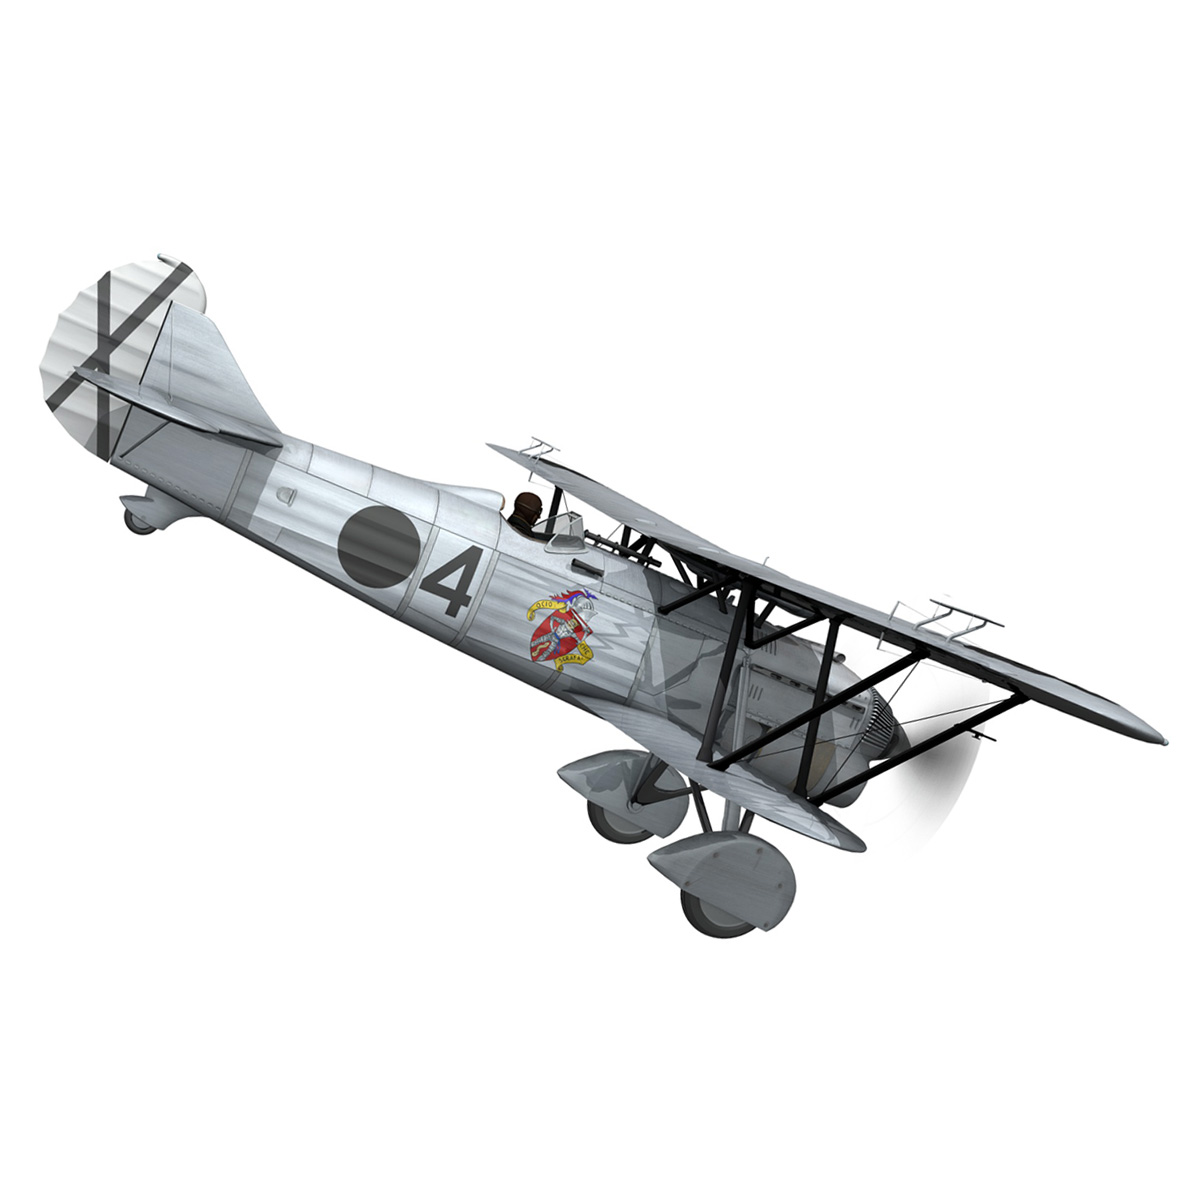 fiat cr.32 – italy air force – gruppo baleari 3d model fbx c4d lwo obj 252213